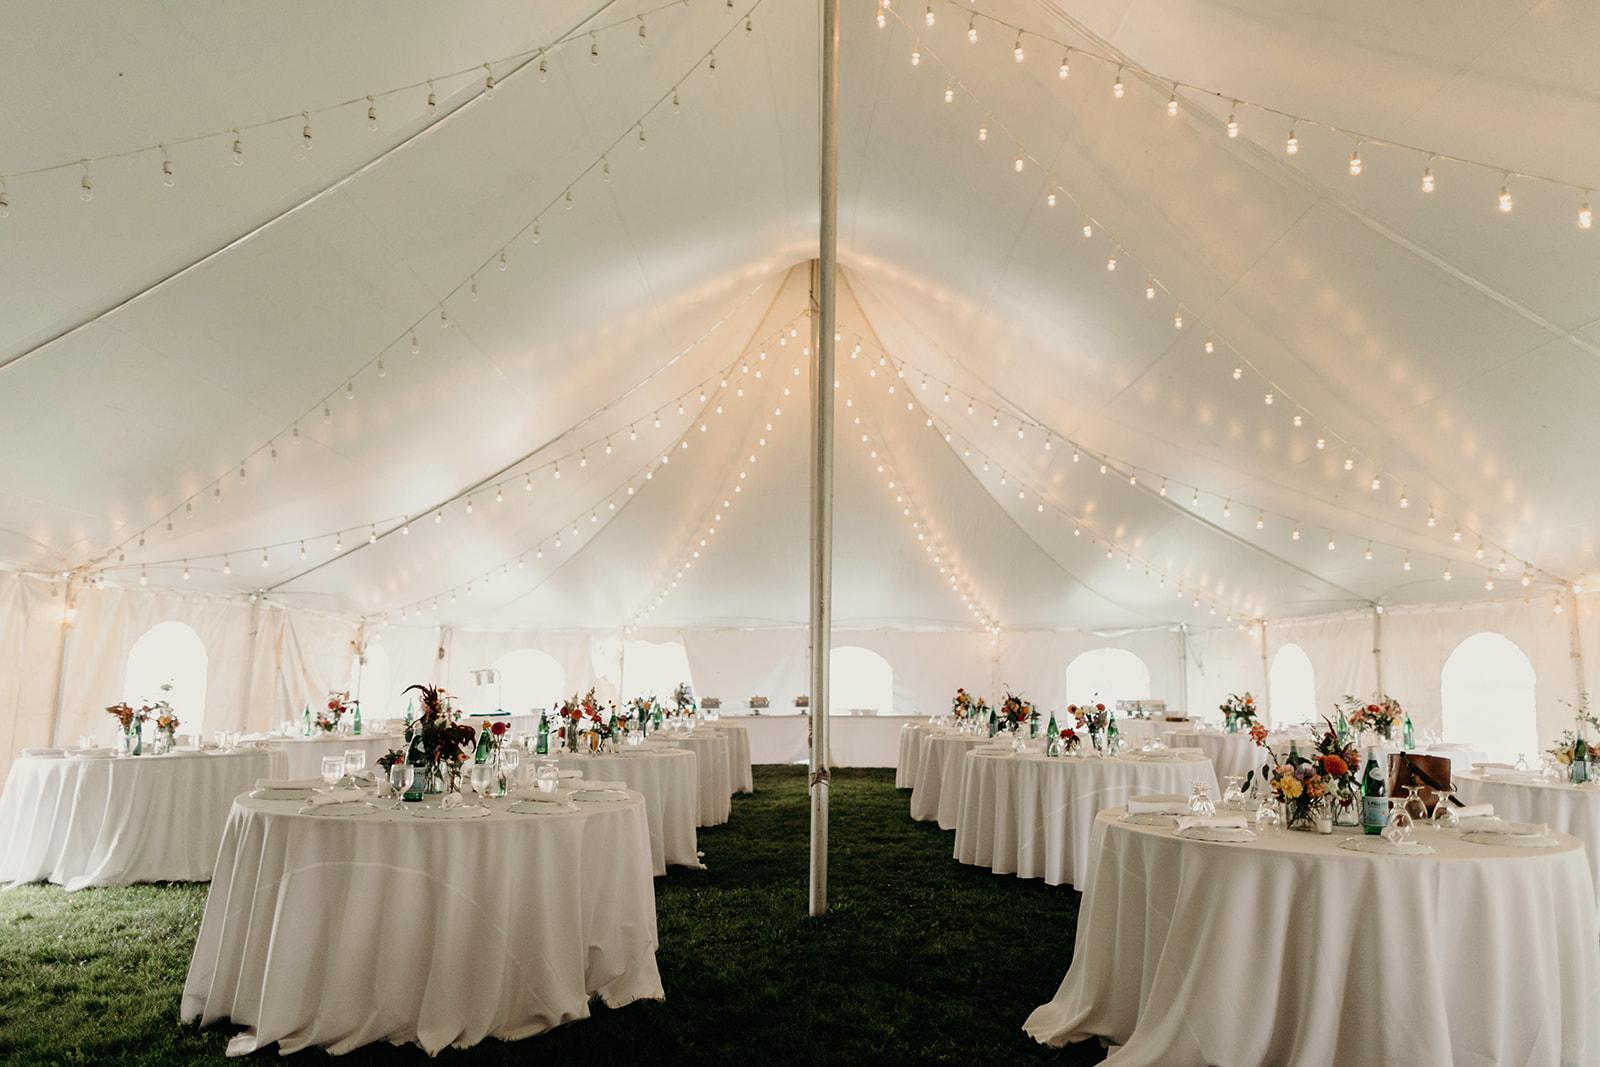 wedding table set up at reception